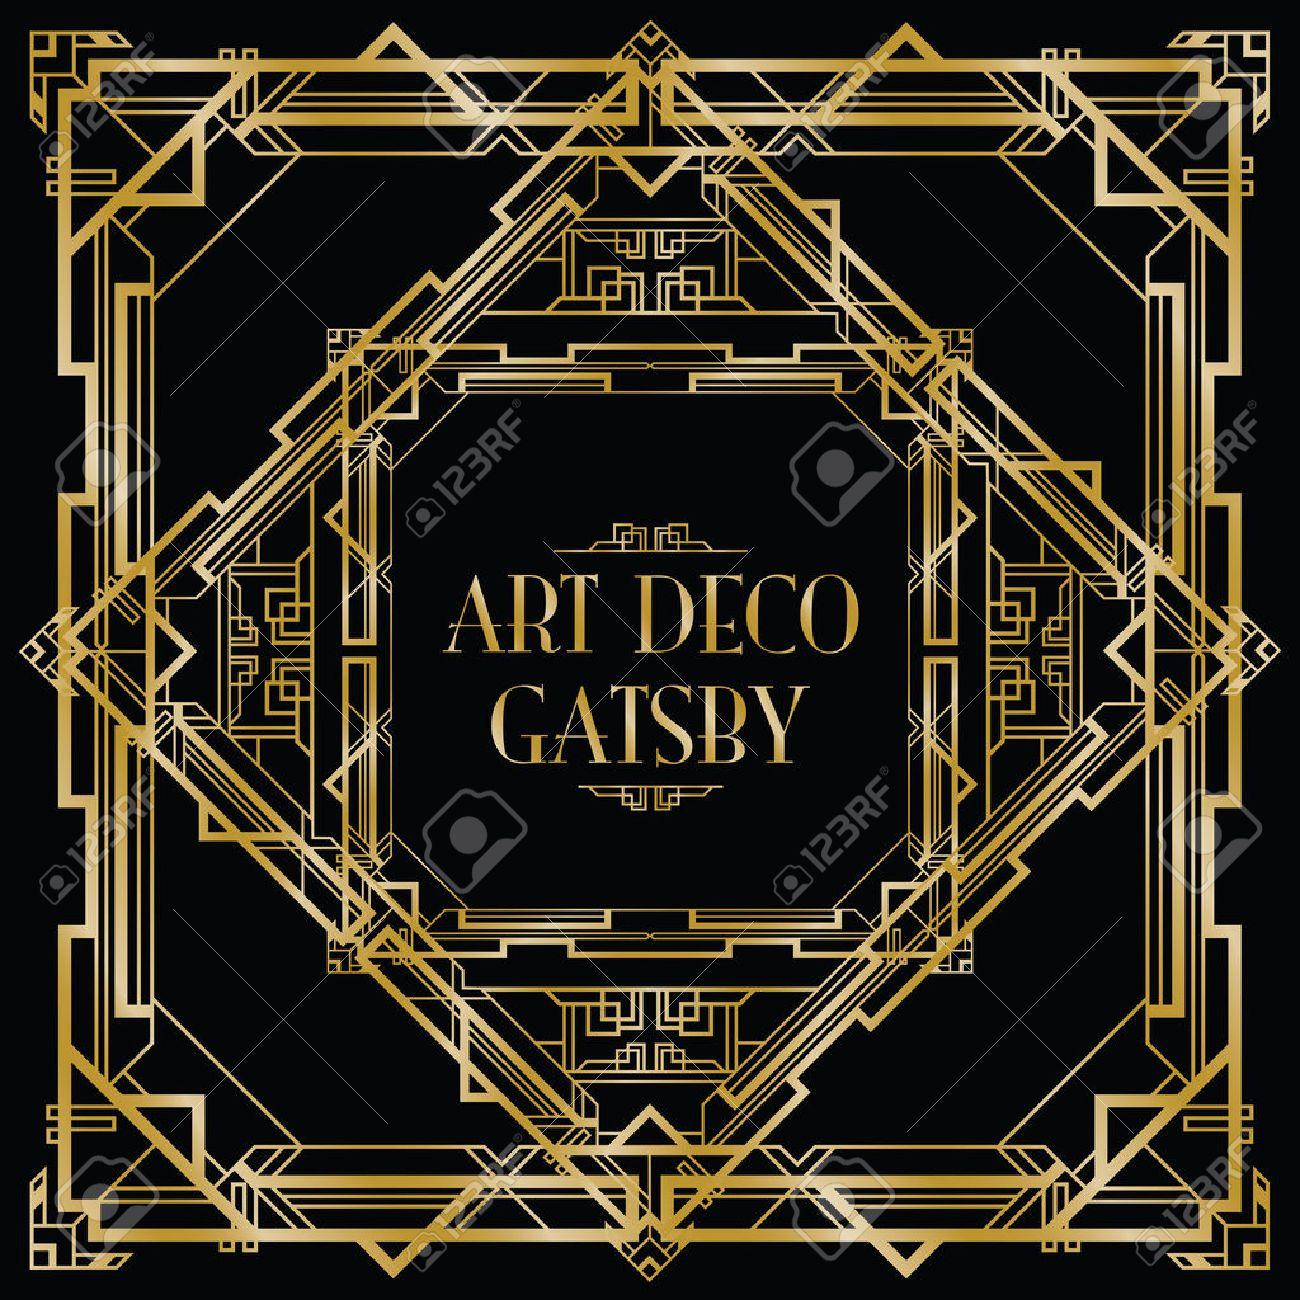 Gatsby art deco background royalty free cliparts vectors and gatsby art deco background stock vector 30730279 voltagebd Images